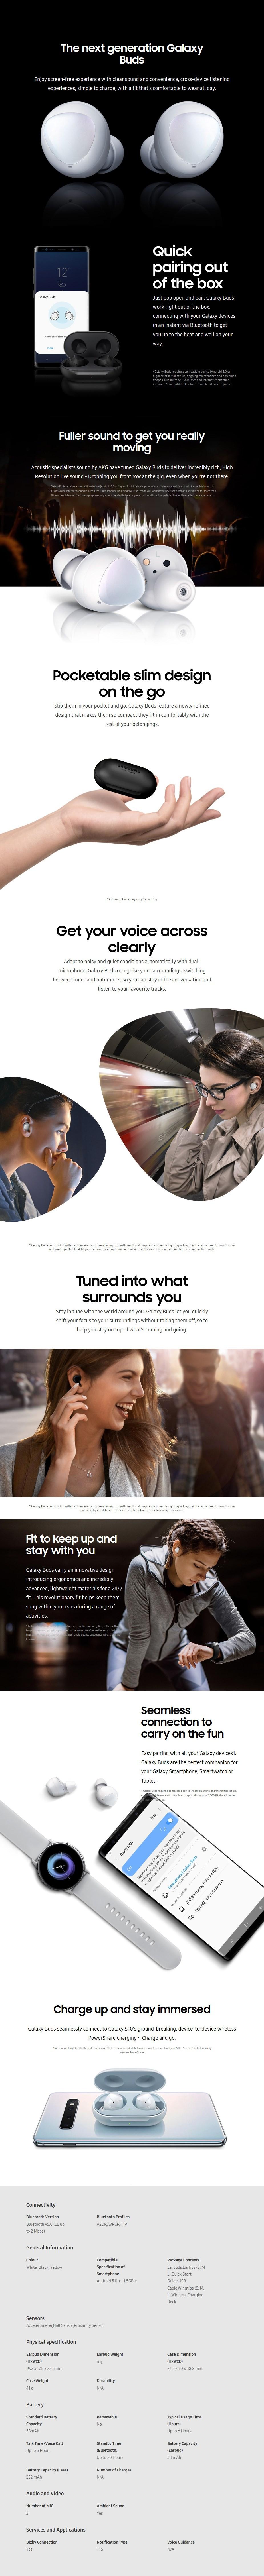 Samsung Galaxy Buds - Black - Desktop Overview 1